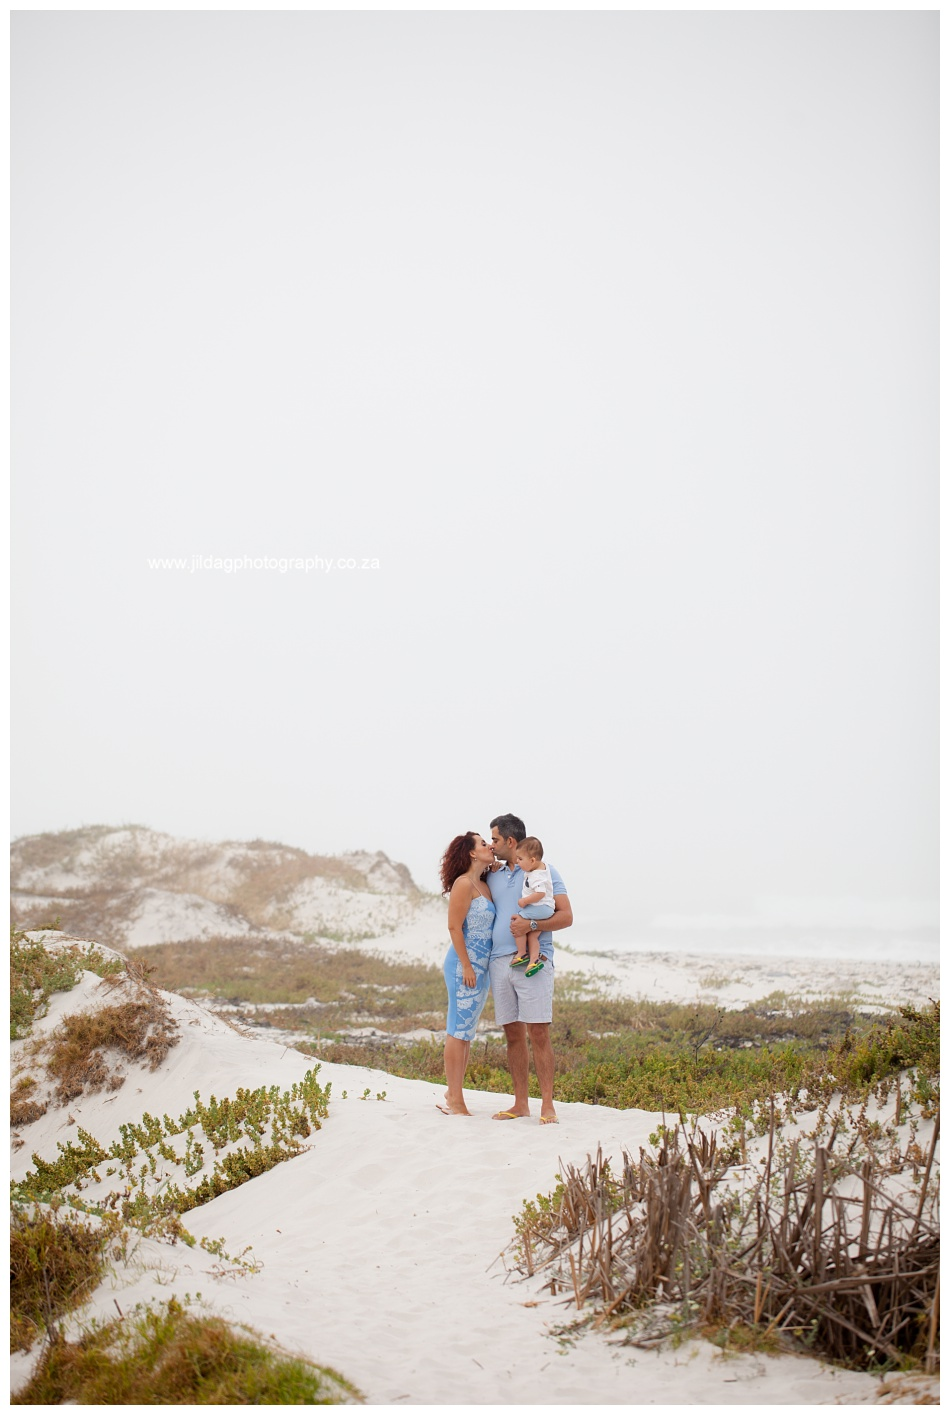 Jilda-G-Photography-family-photographer-beach_0672